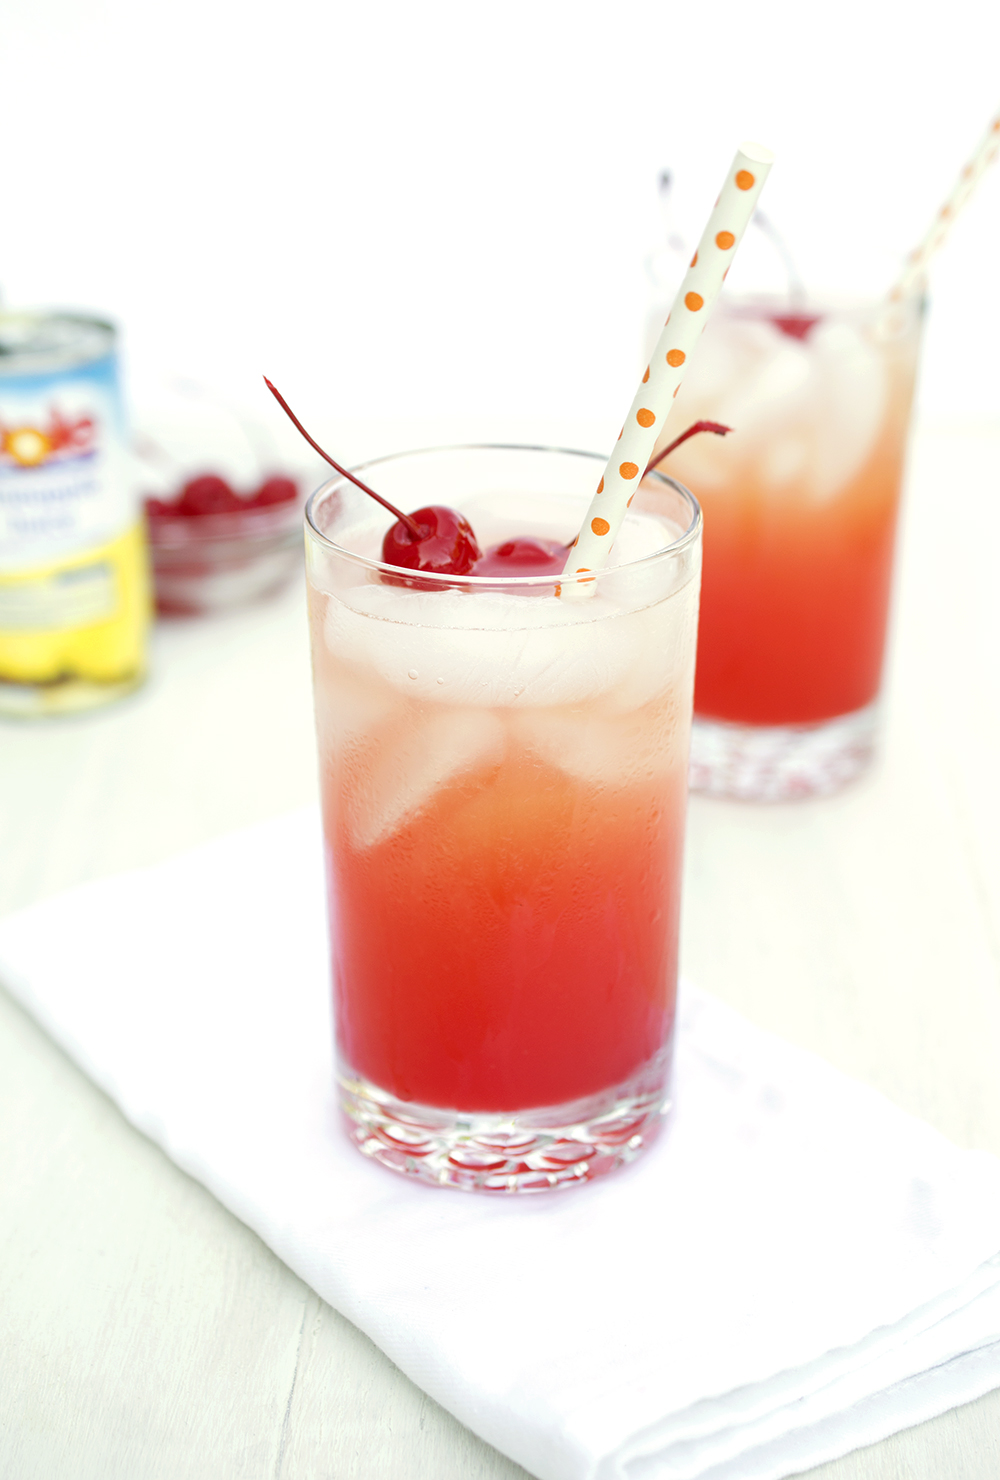 Pineapple Sunset Cocktail